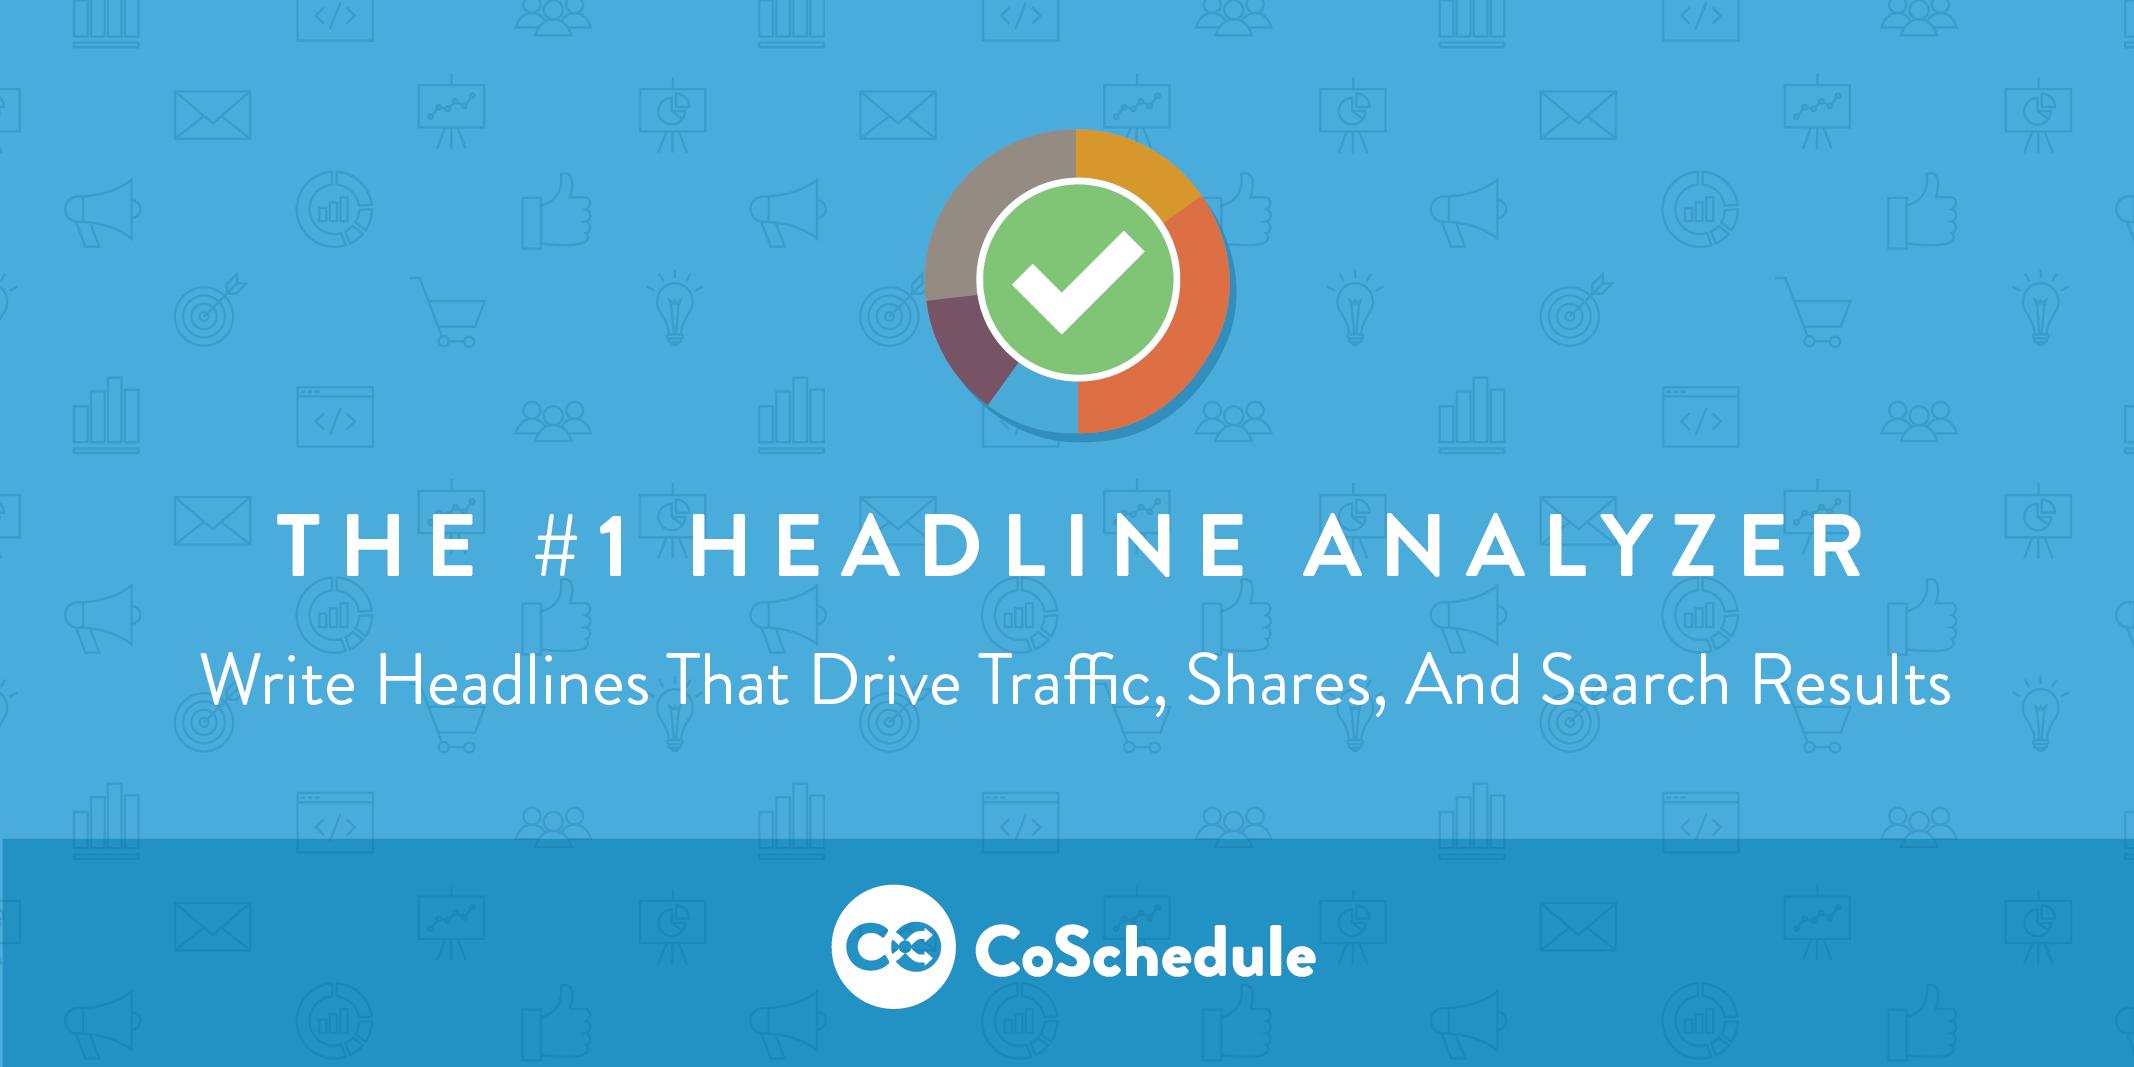 Pics of Headline Analyzer by coschedule